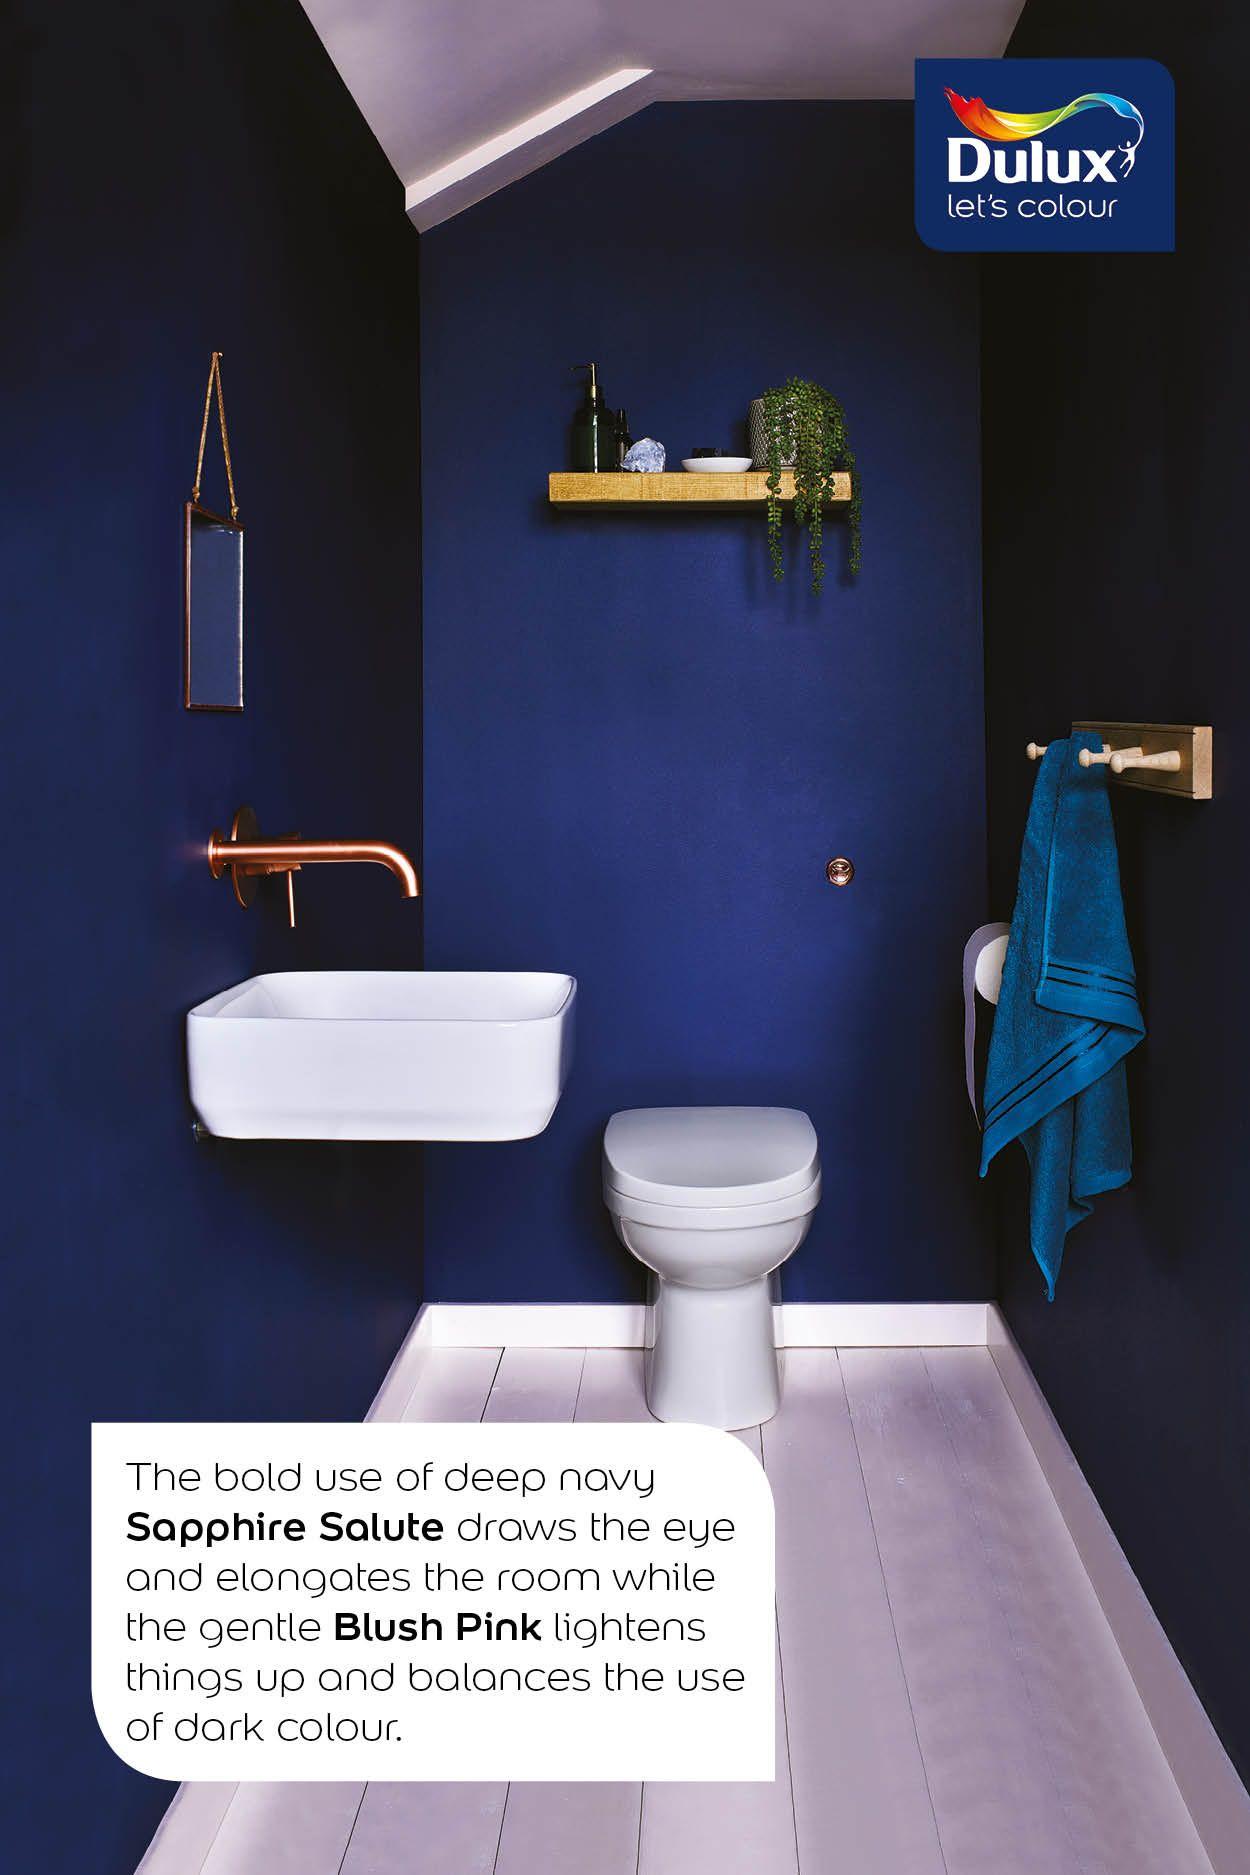 Dark Blue Bathroom Idea In 2020 Dark Blue Bathrooms Blue Bathroom Small Toilet Room